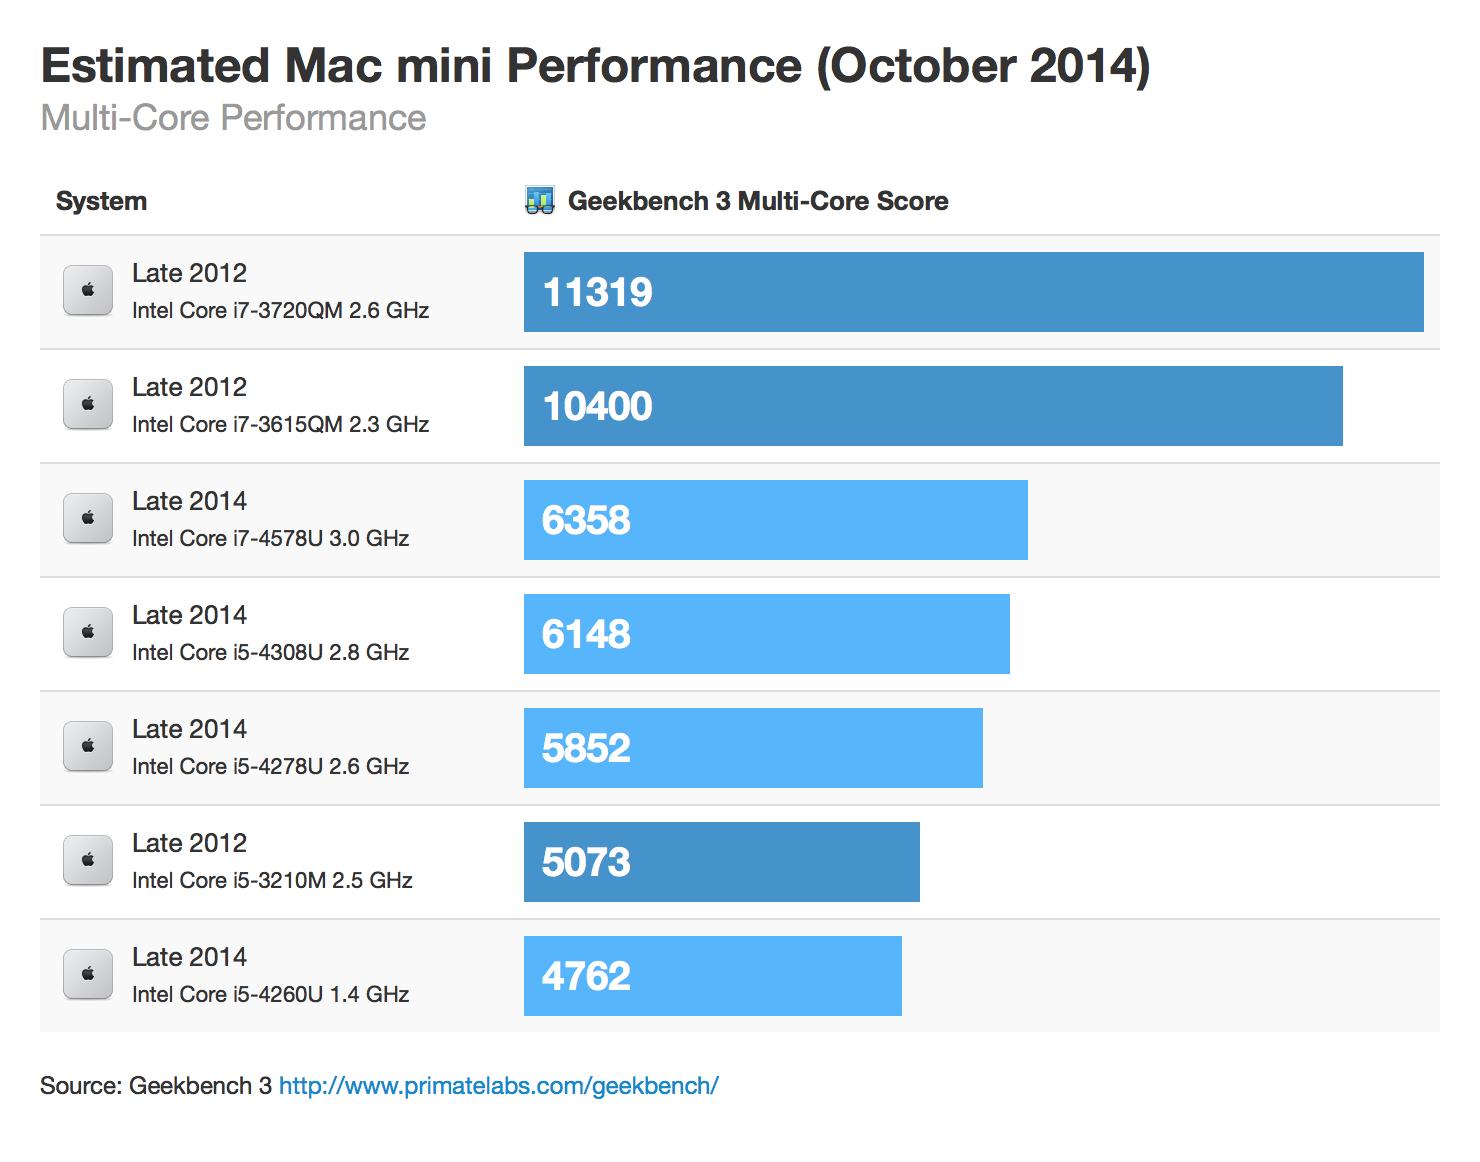 Estimating Mac mini Performance